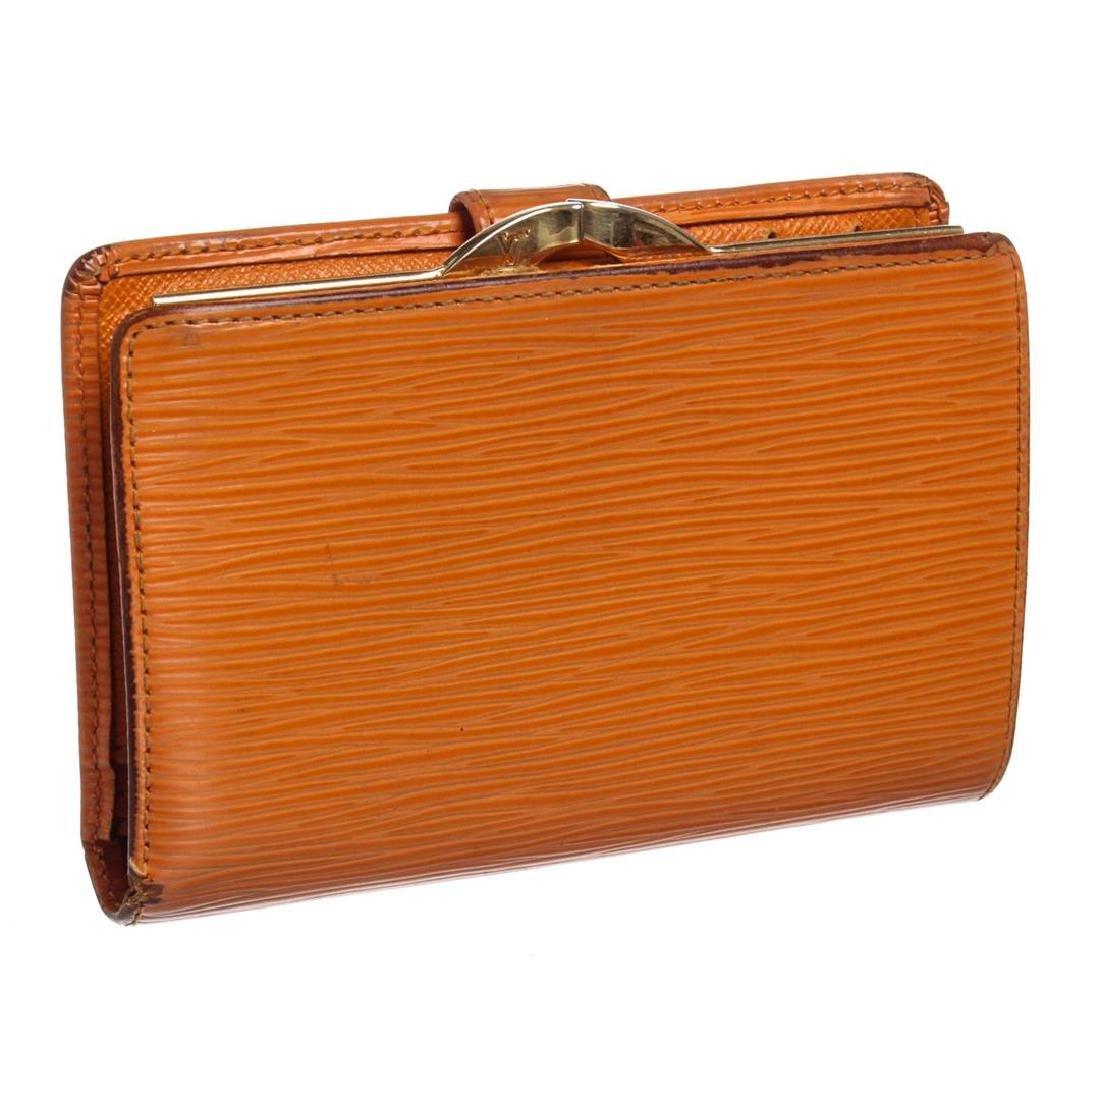 Louis Vuitton Orange Epi Leather French Purse Wallet - 2